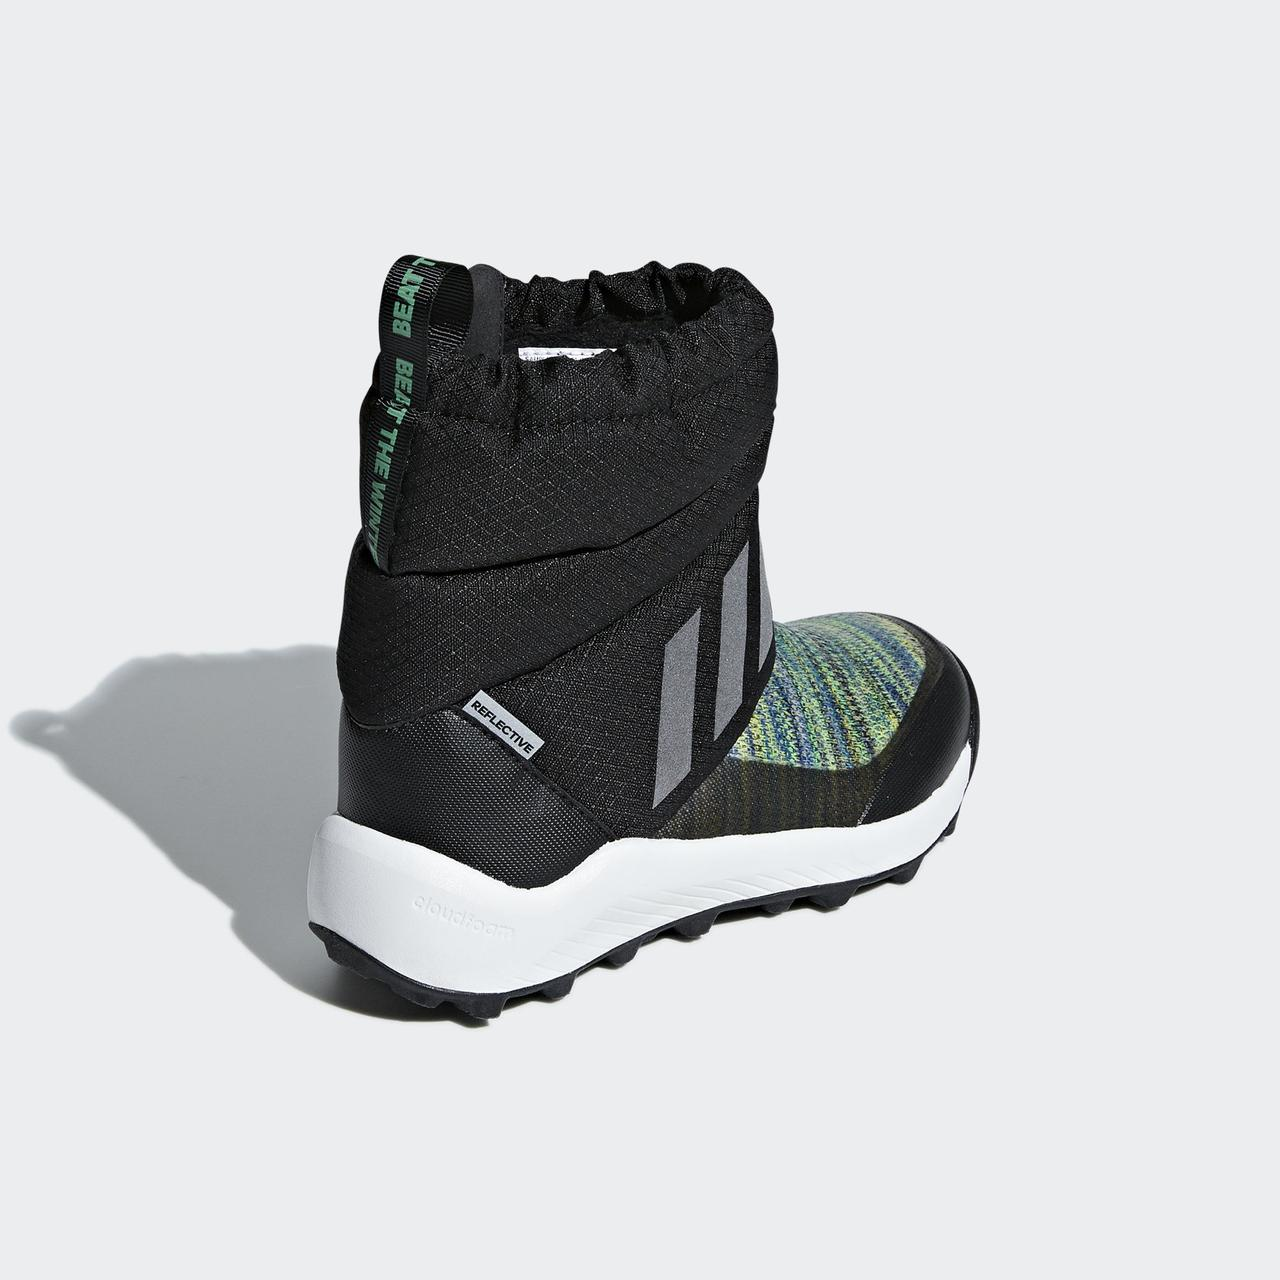 Детские сапоги Adidas Performance Rapidasnow Beat The Winter (Артикул   AH2604), ... 053321005ab